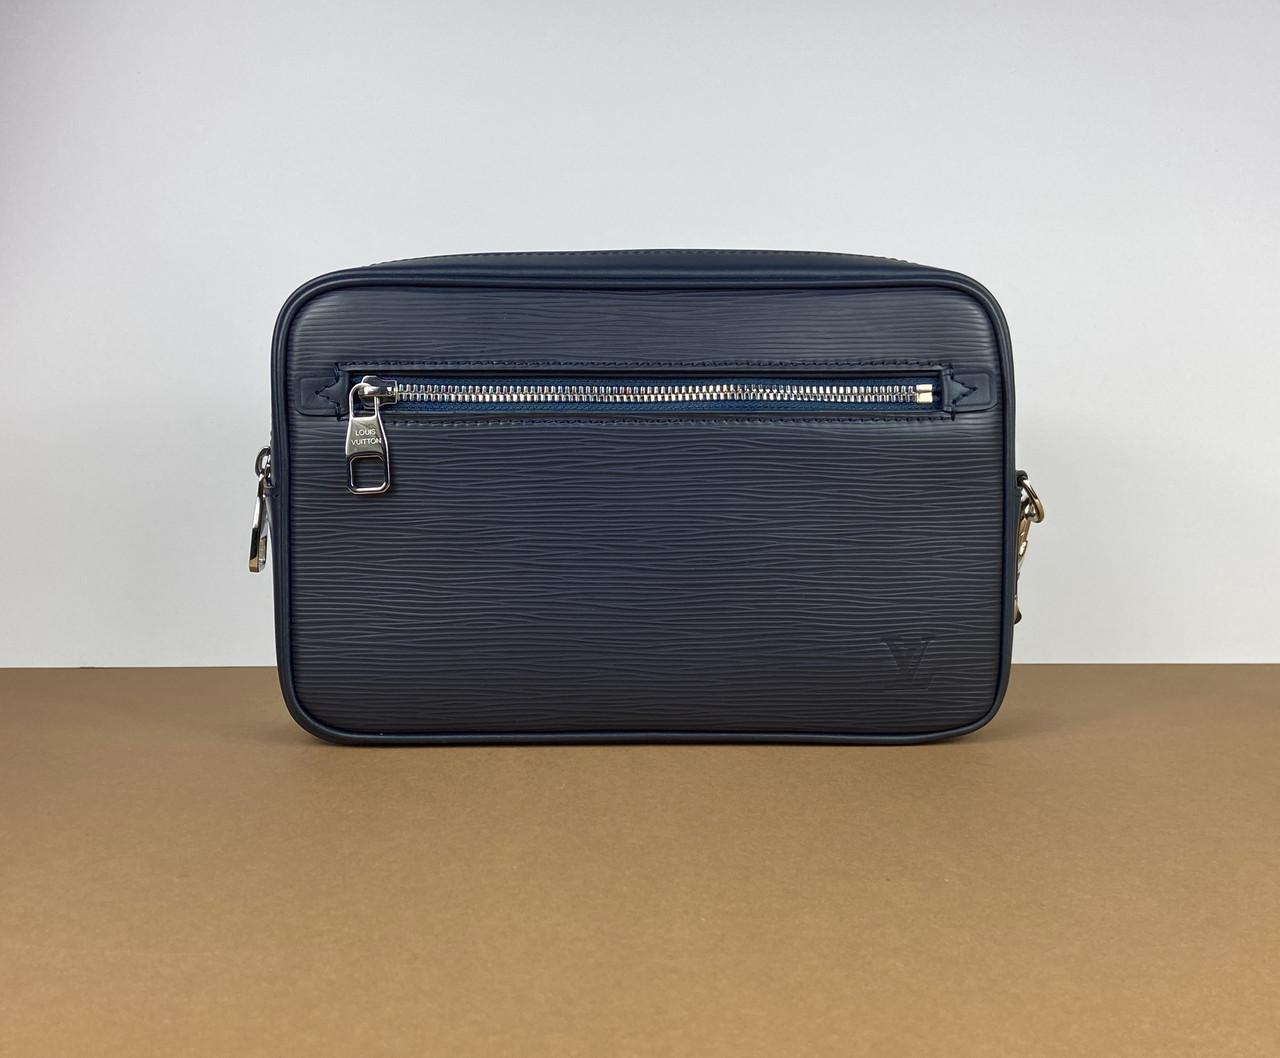 Клатч - барсетка Louis Vuitton Kasai (Луи Виттон) арт. 32-27